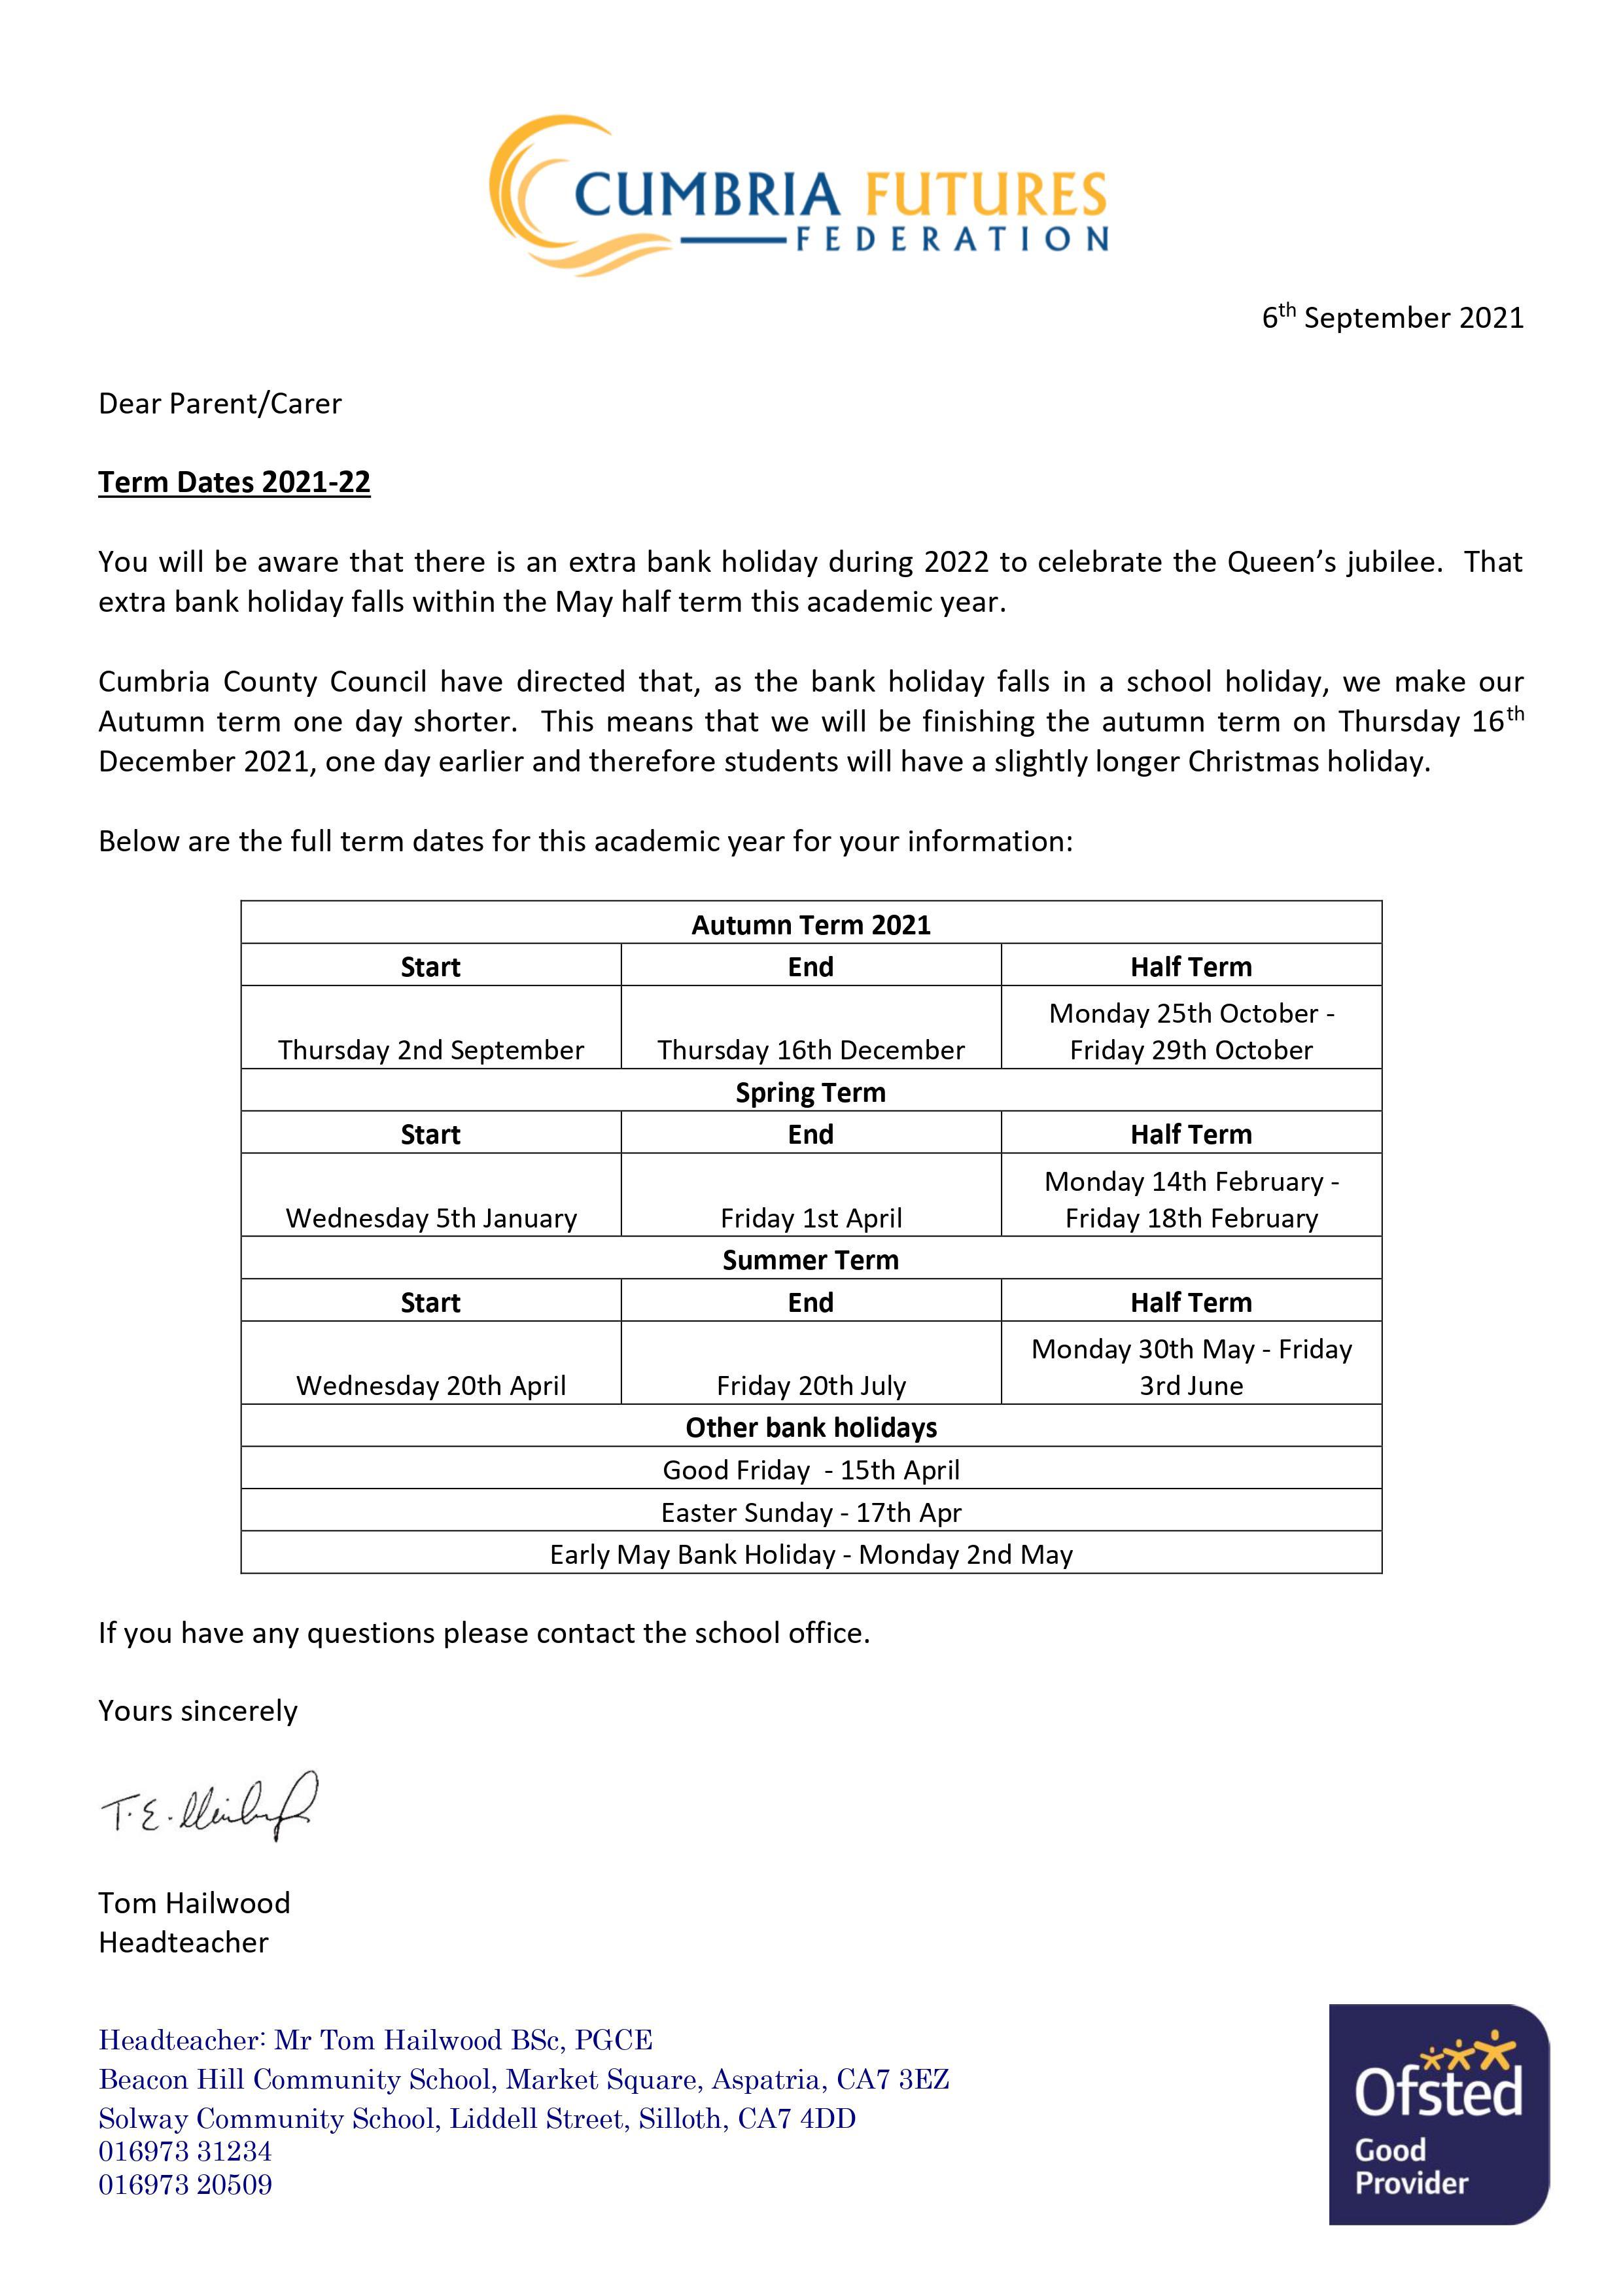 Term Dates 2021-22 060921